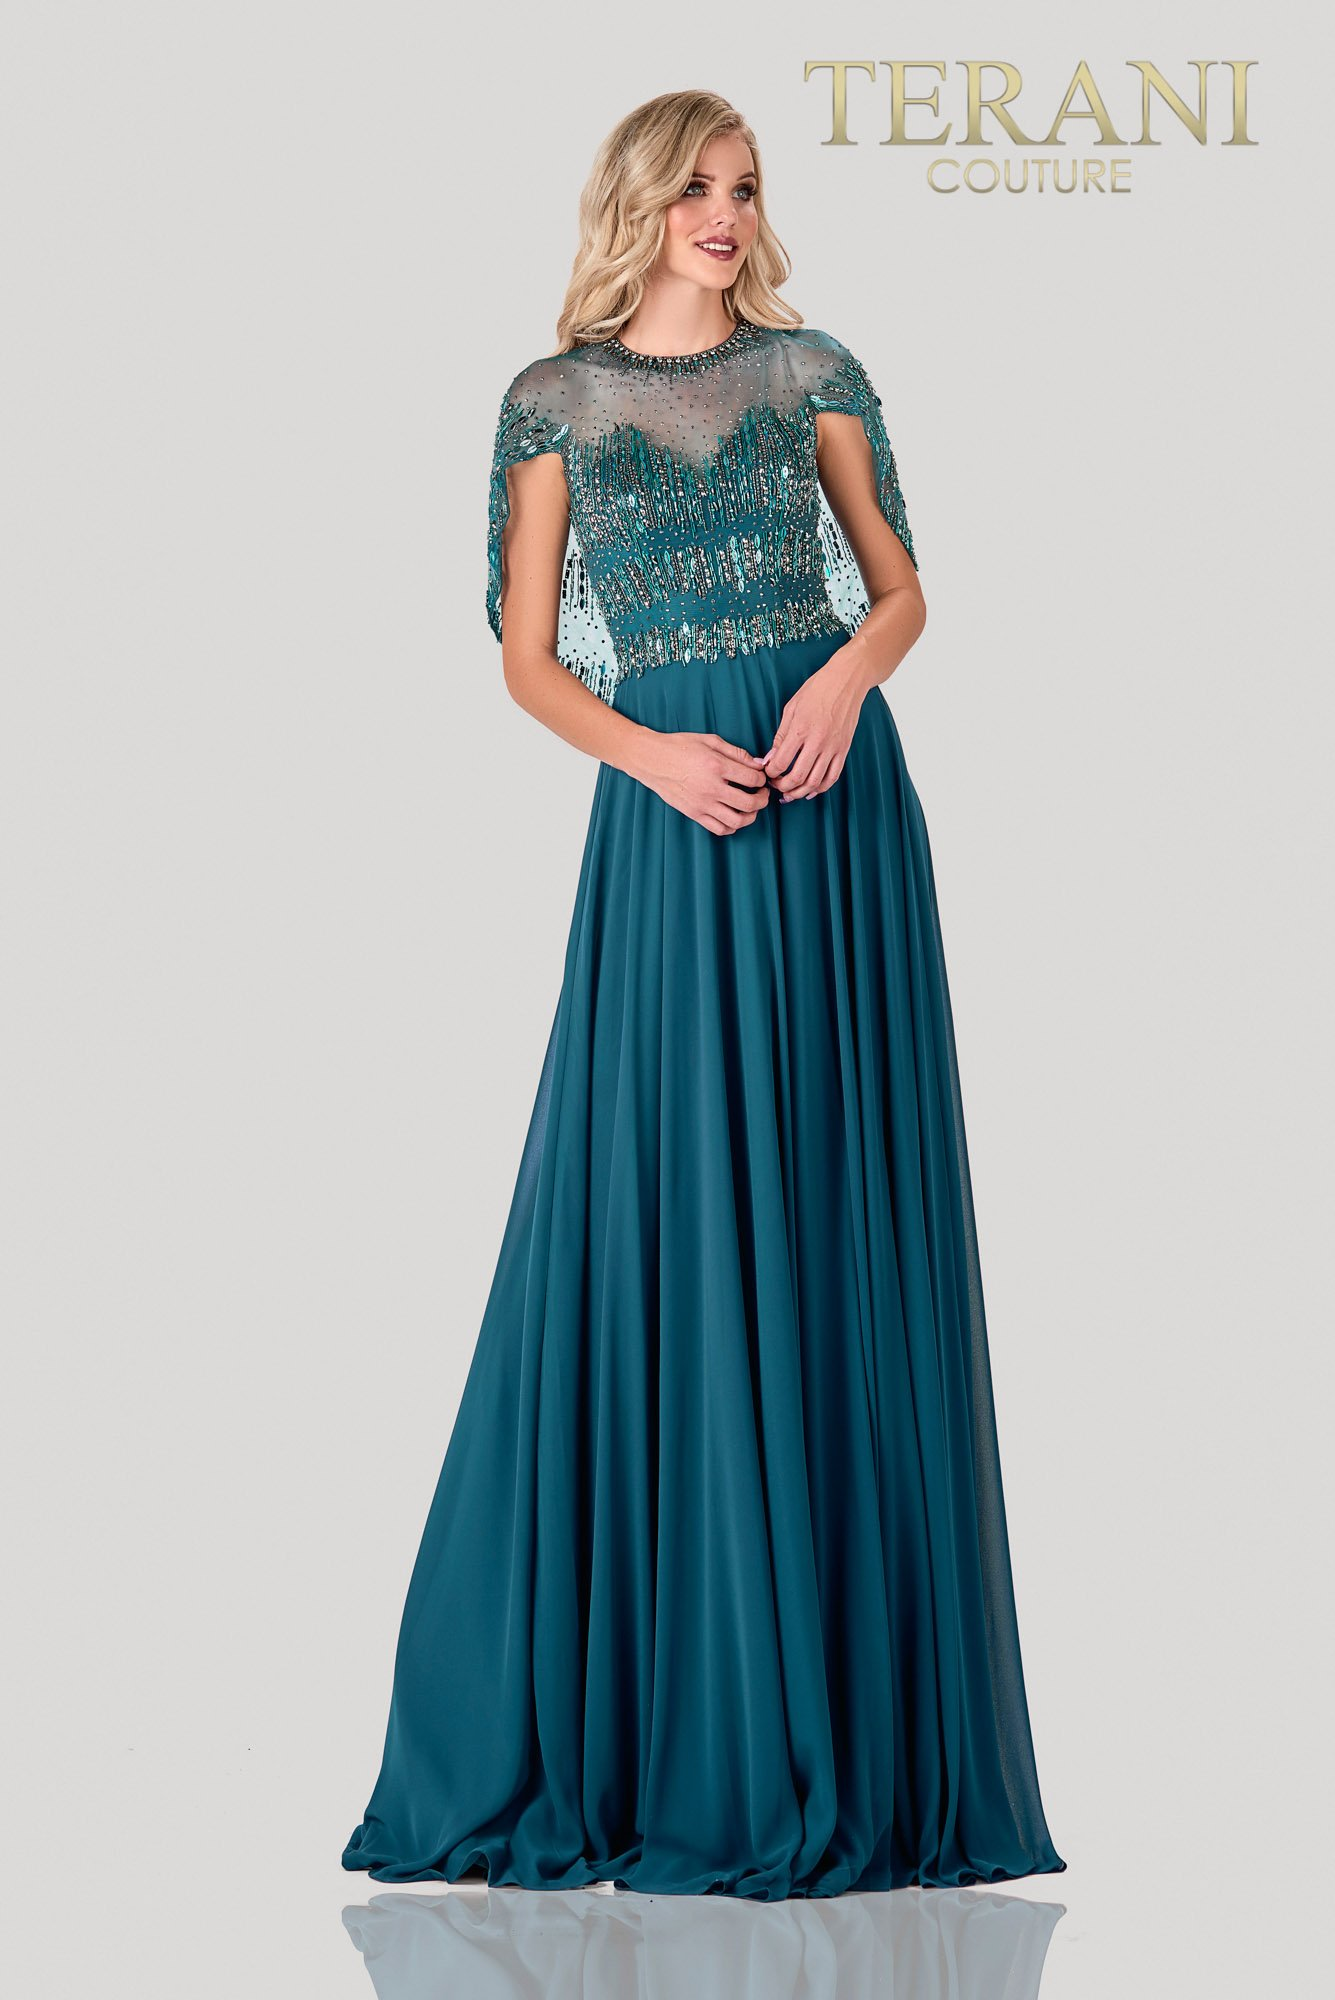 Bead Embellished Mother Of The Bride Dress - 2111M5295